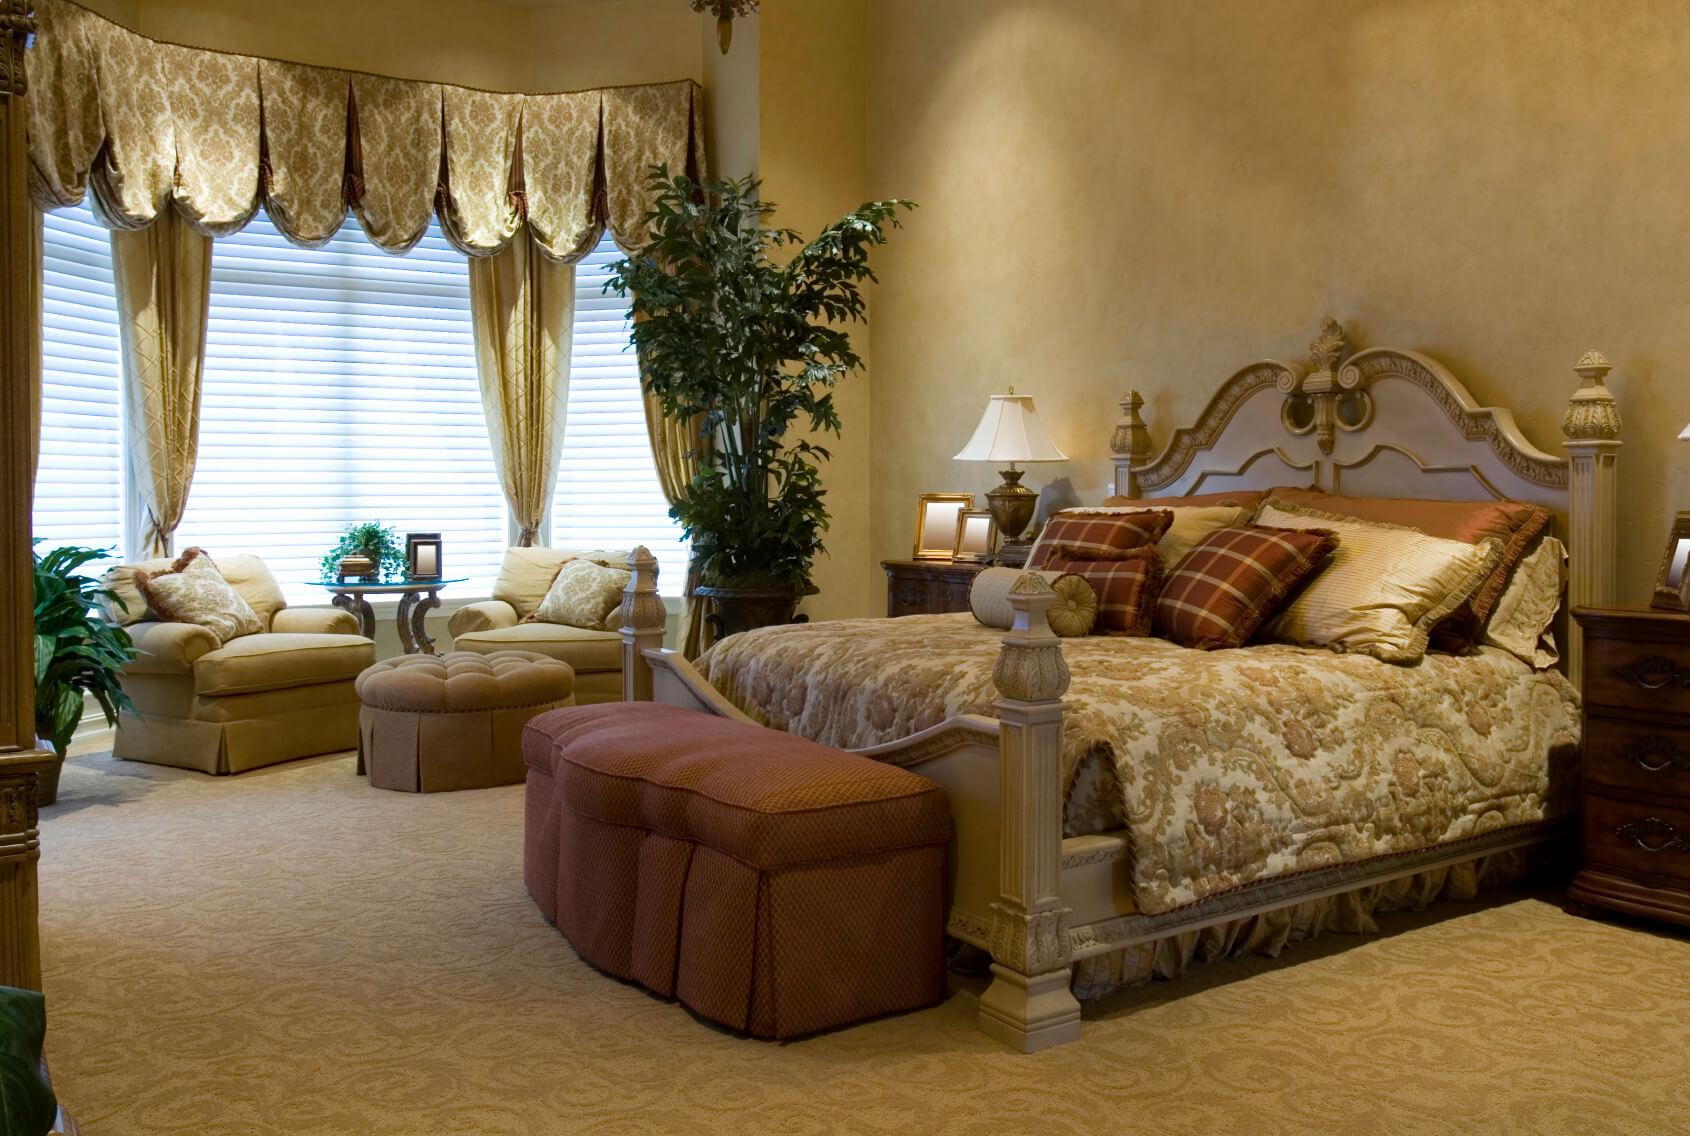 custom-bedding-linens-fabric-atlanta-georgia-4.jpg